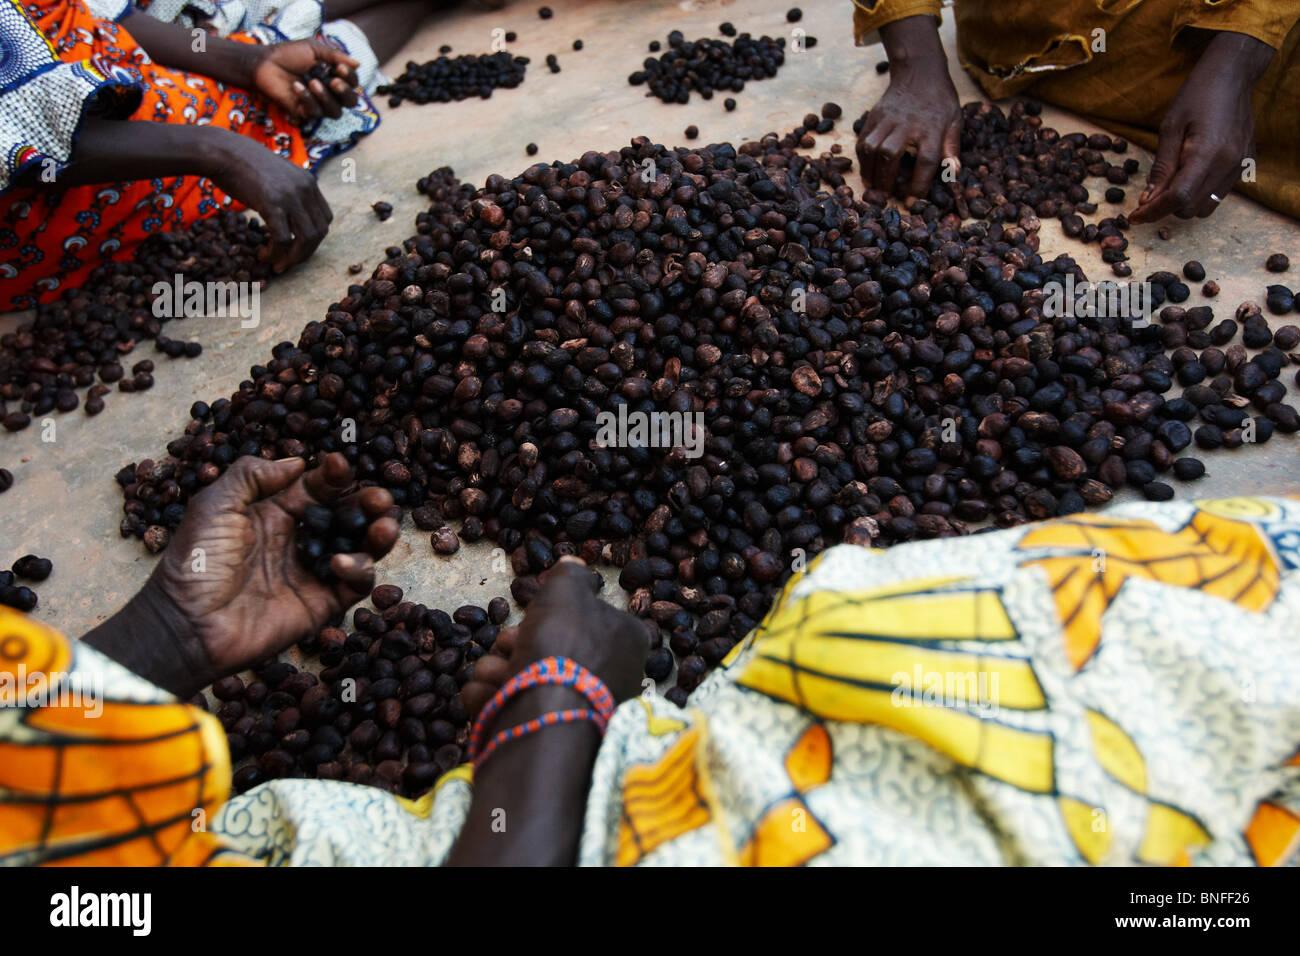 Women sort shea nuts at the Dembayouma shea processing center in the village of Bankoumana, near Bamako, Mali - Stock Image